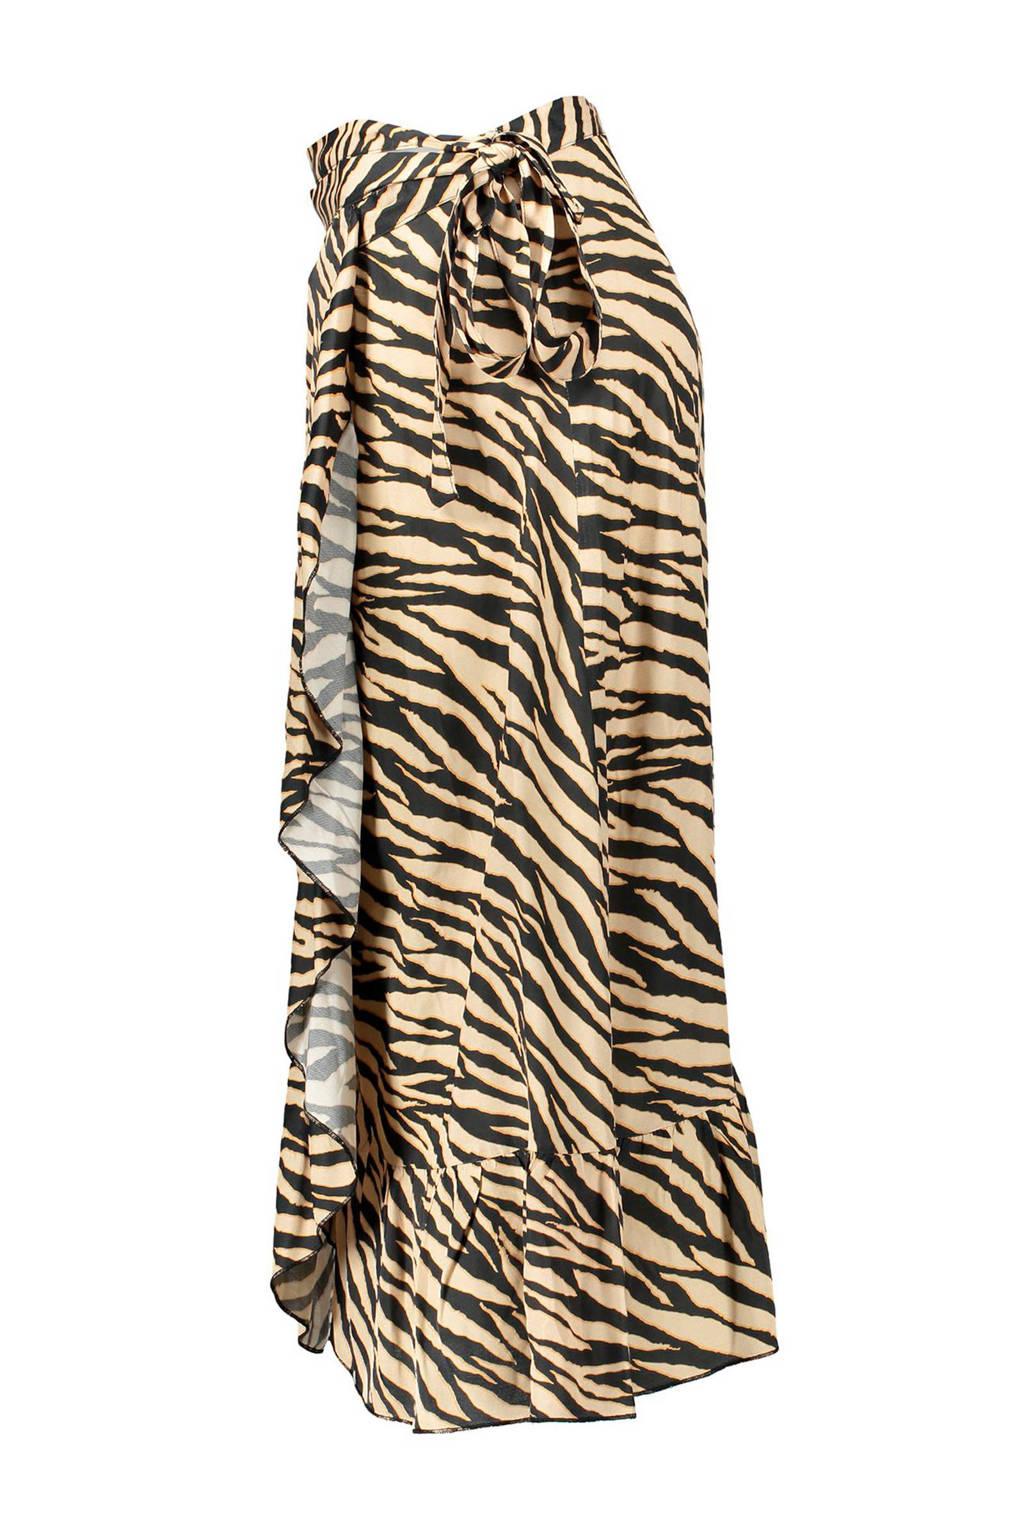 Geisha rok met zebraprint zand/zwart, Zand/zwart